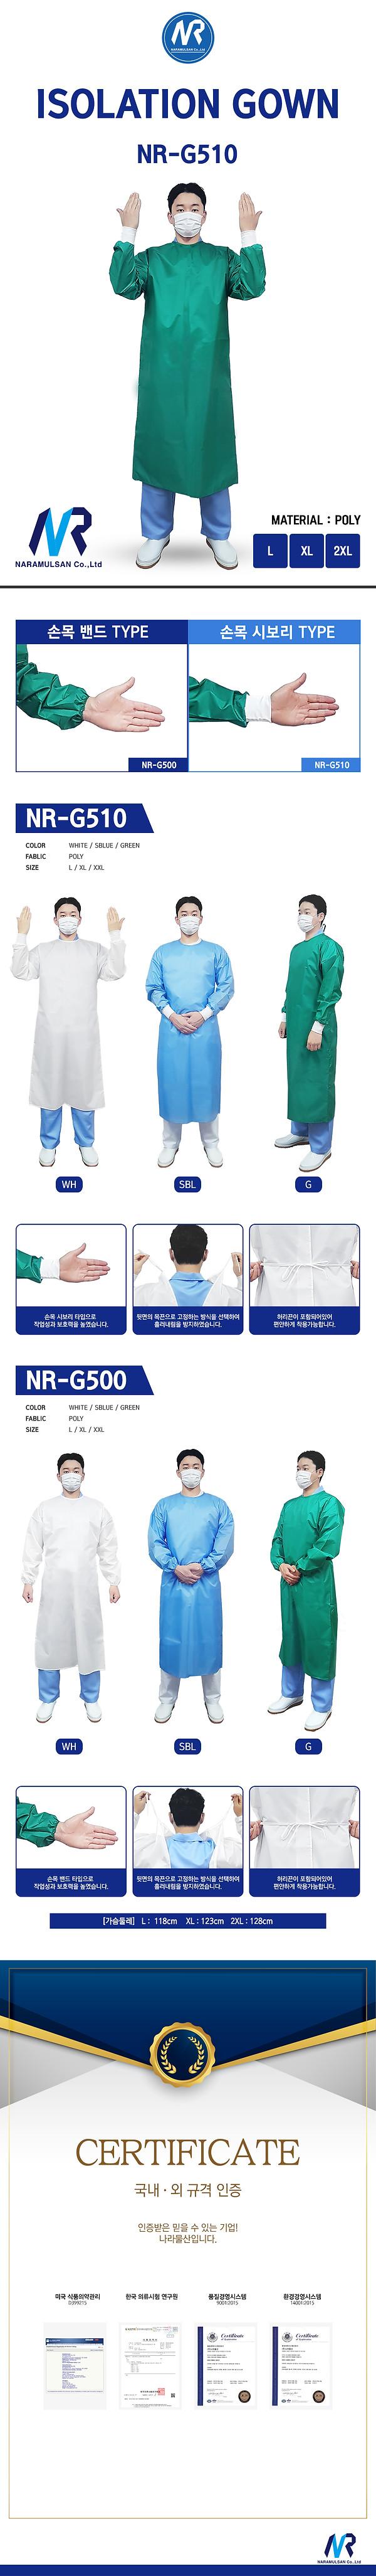 NR-G510(인증마크없음).jpg